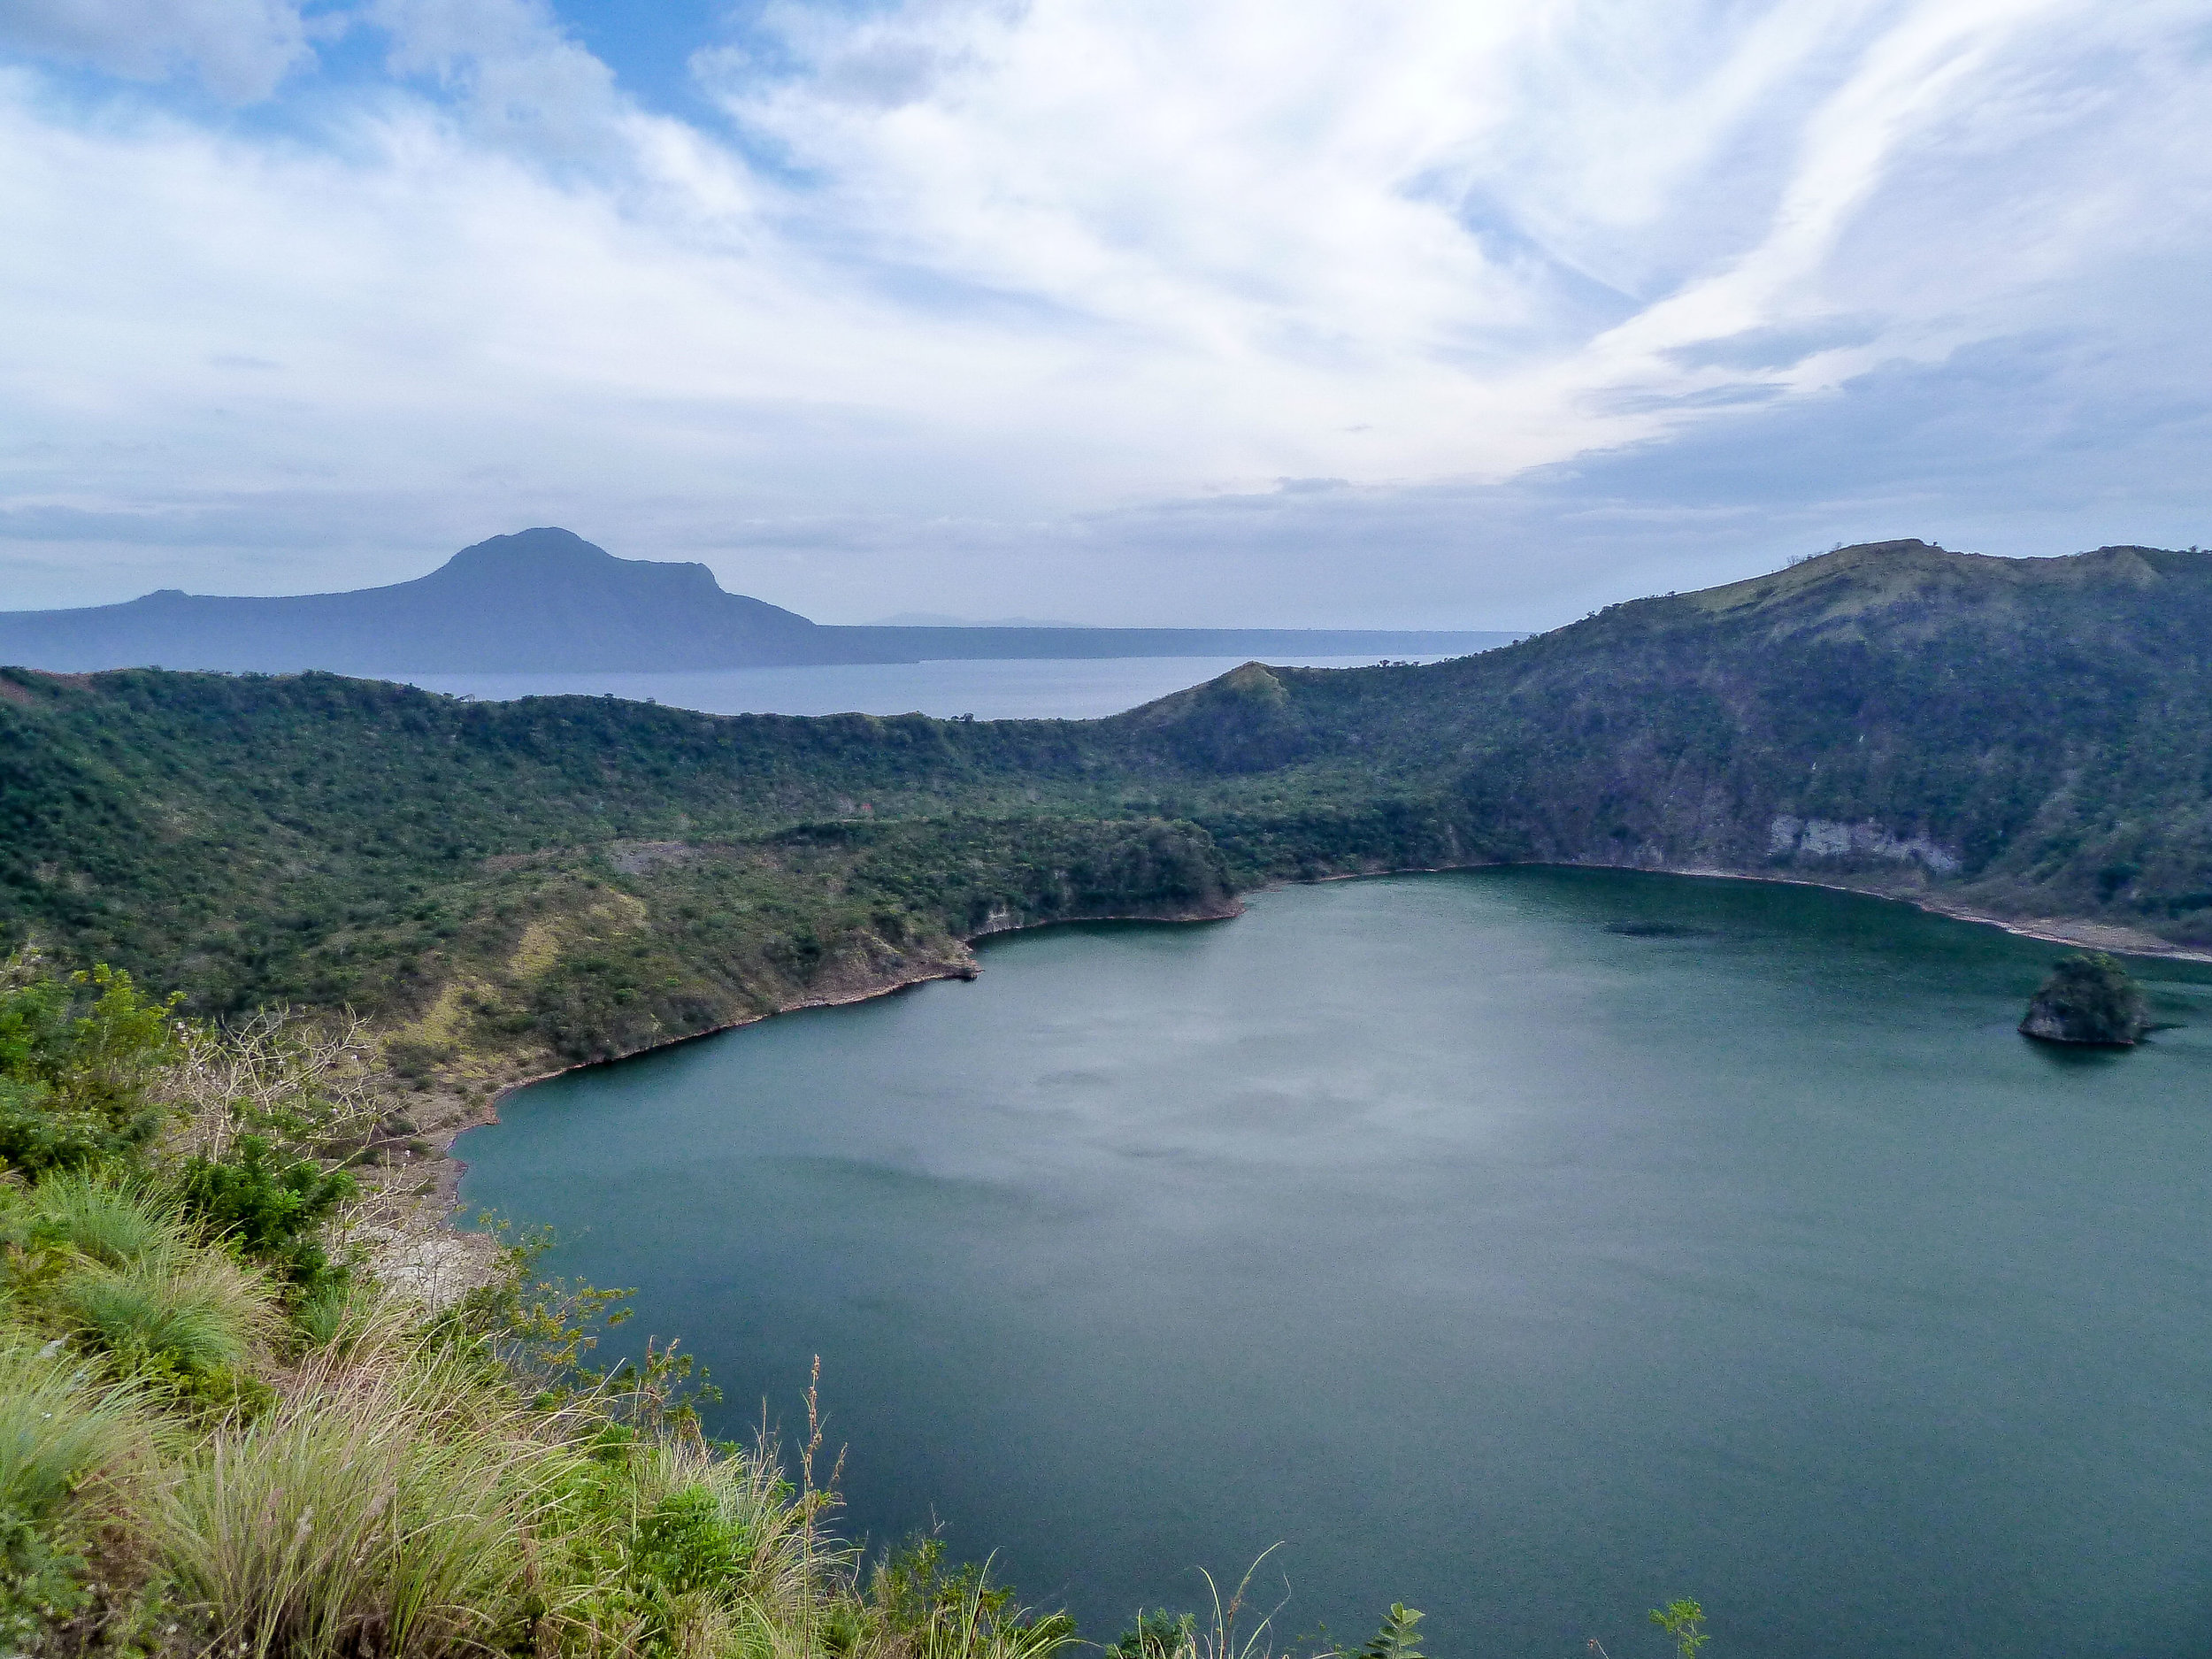 The lake in the volcano at Tagaytay